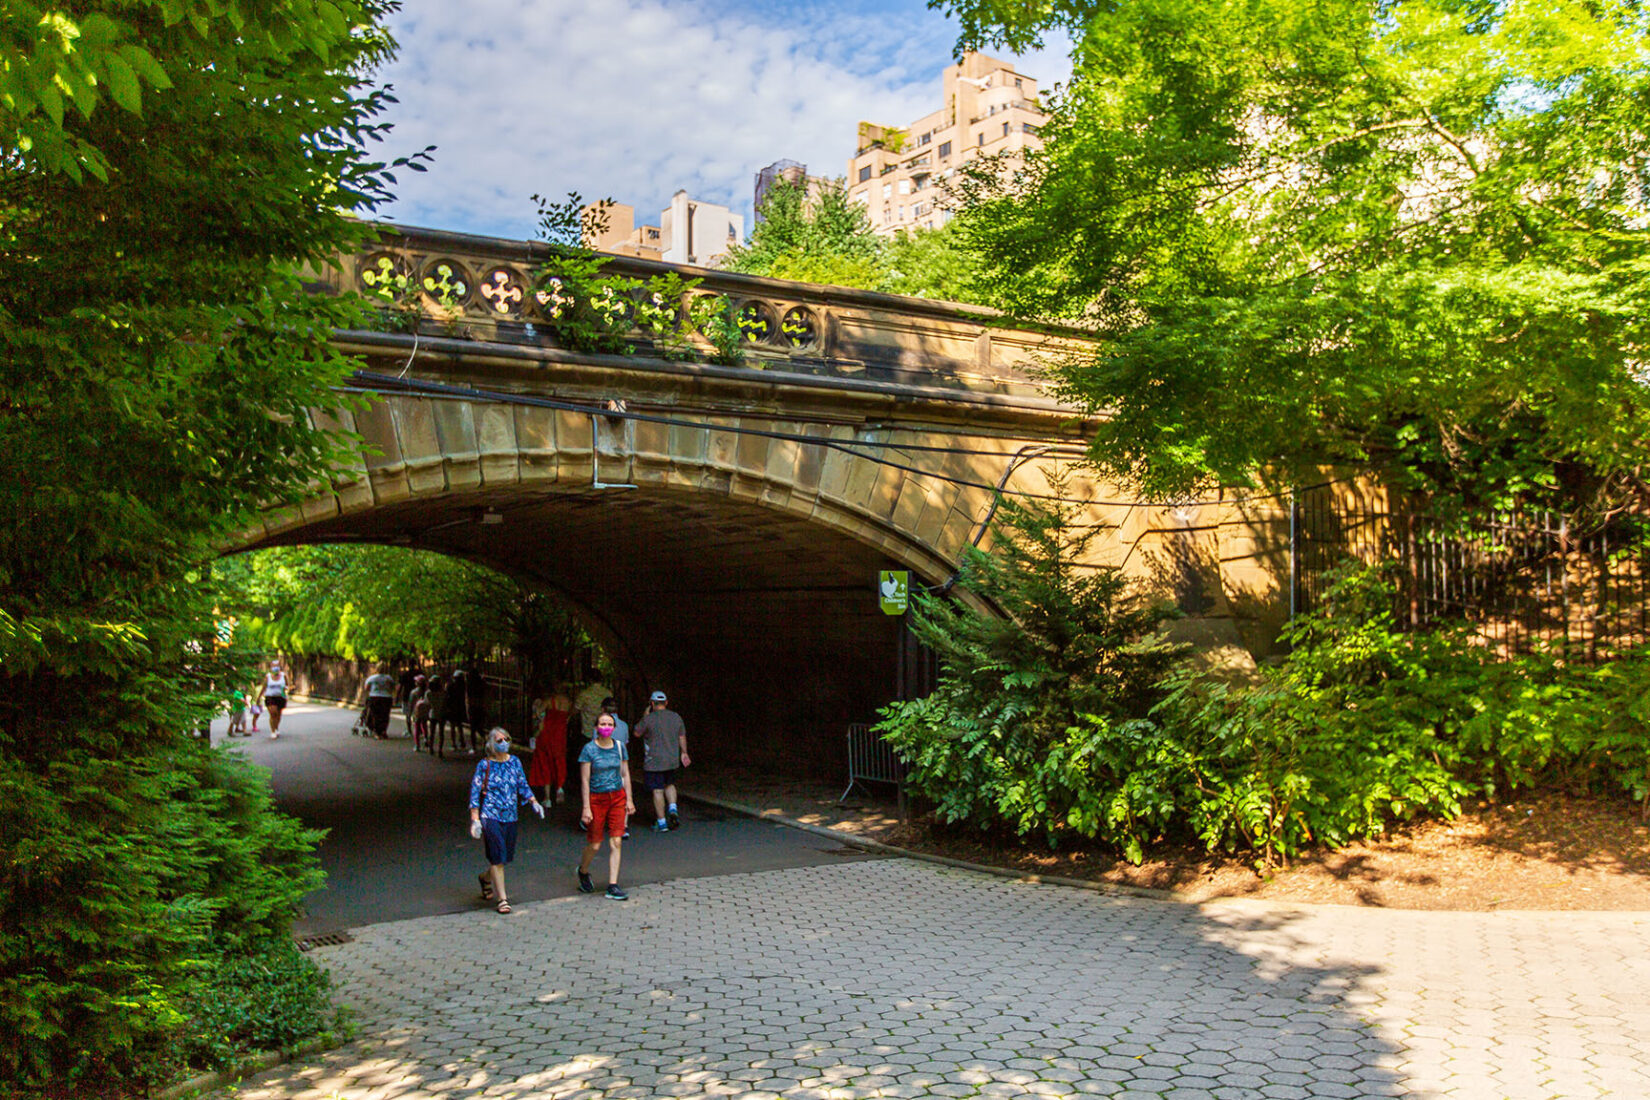 Masked parkgoers strolling under a bridge near the Children's Zoo in summer